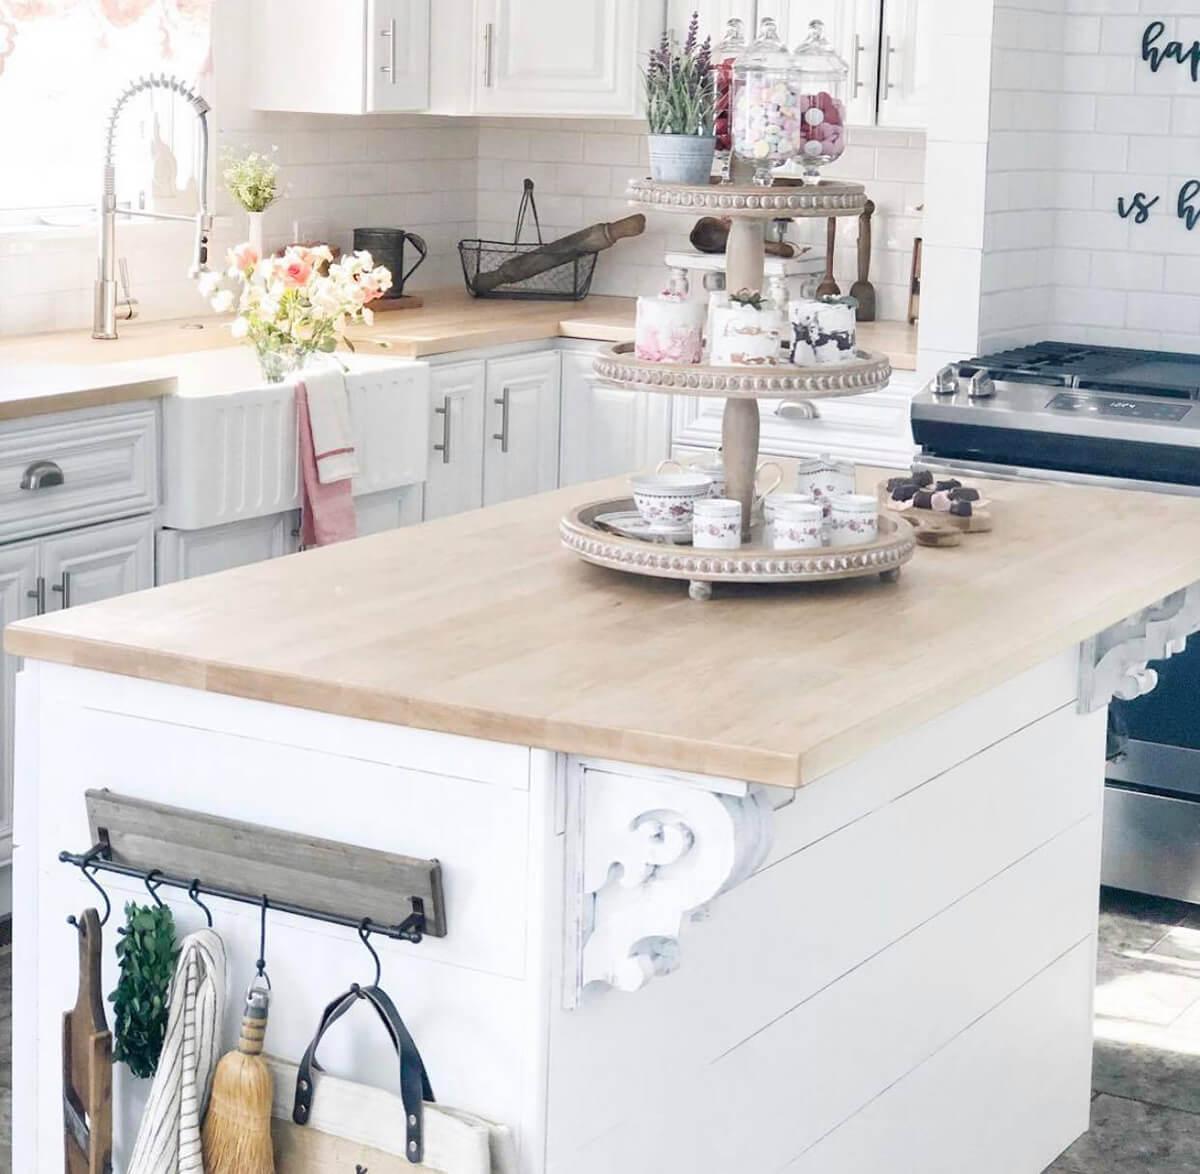 50 Best Farmhouse Kitchen Decor And Design Ideas For 2021